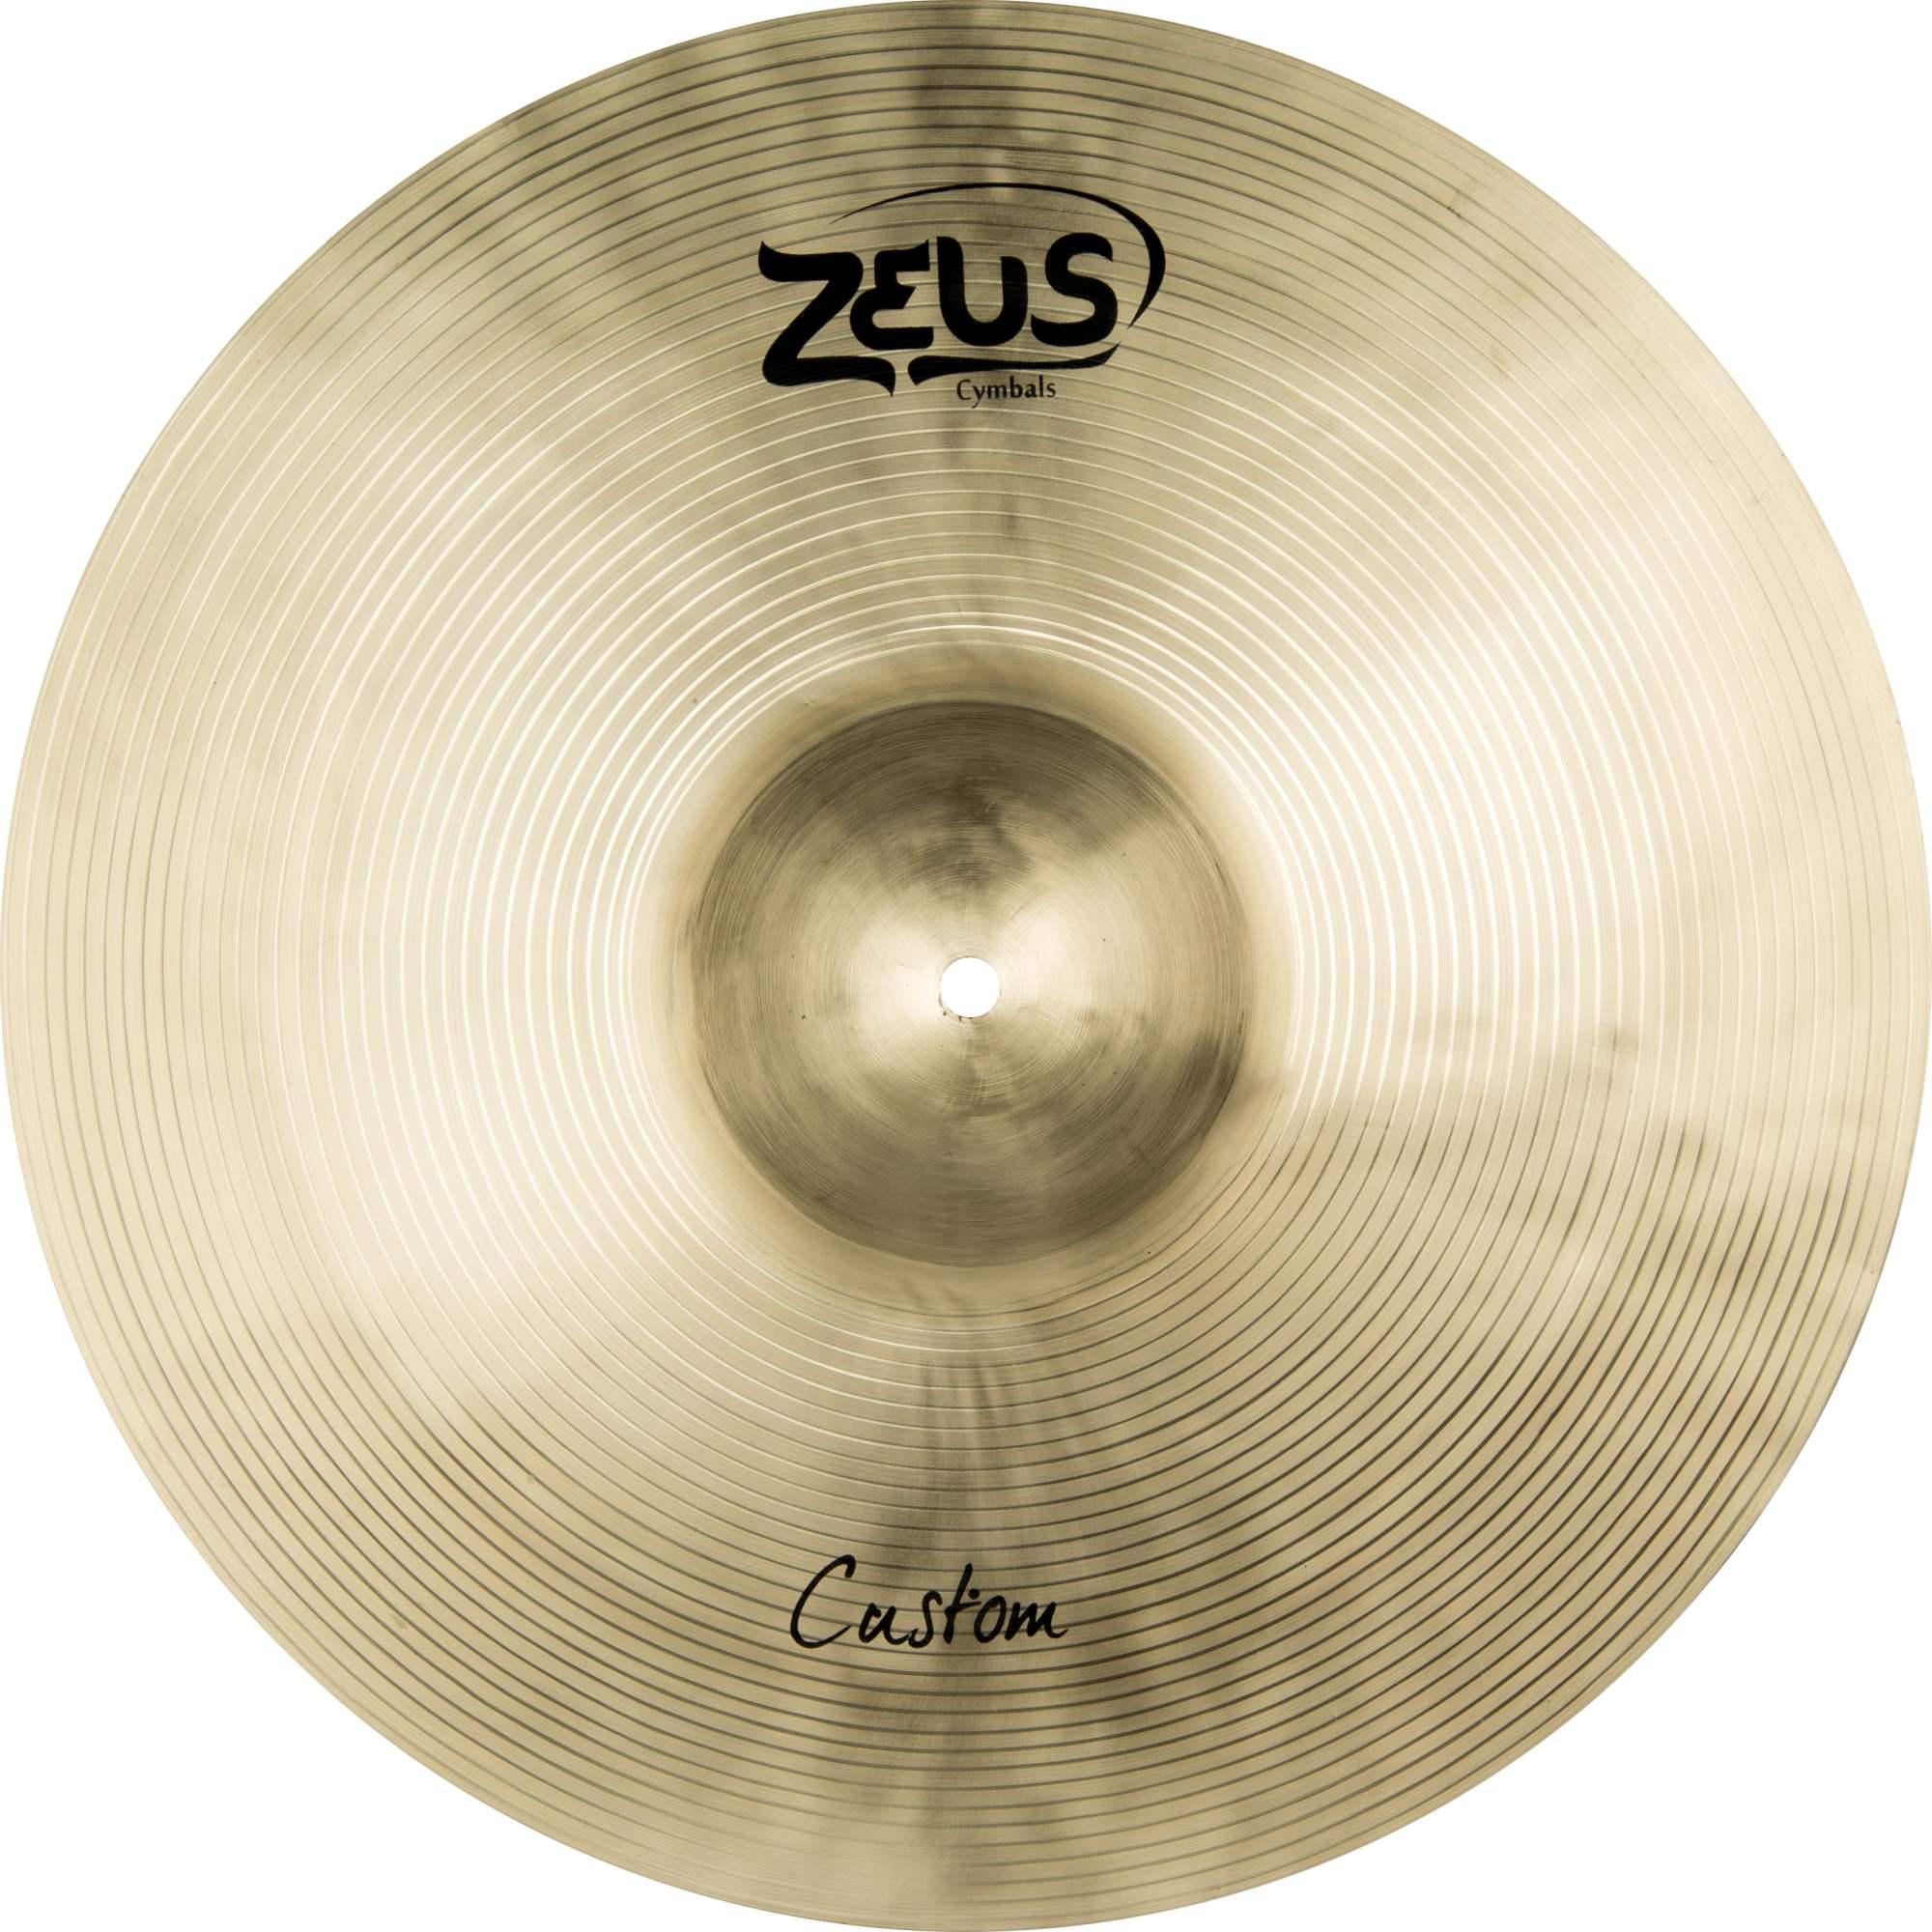 Prato Zeus Custom Crash 17 Zcc17